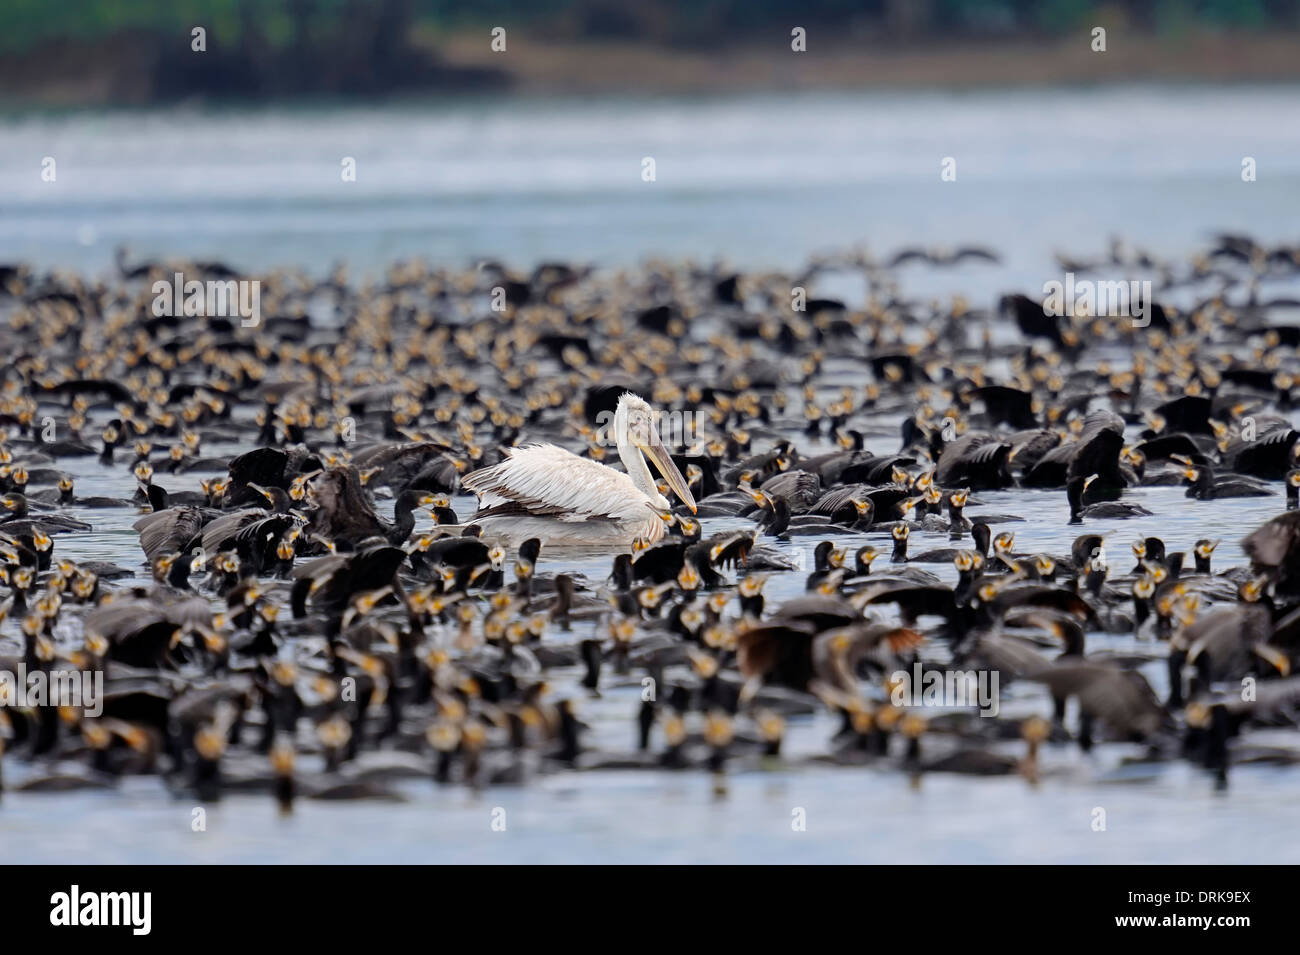 Great Cormorant (Phalacrocorax carbo) and Dalmatien Pelican (Pelecanus crispus), Greece, Europe - Stock Image